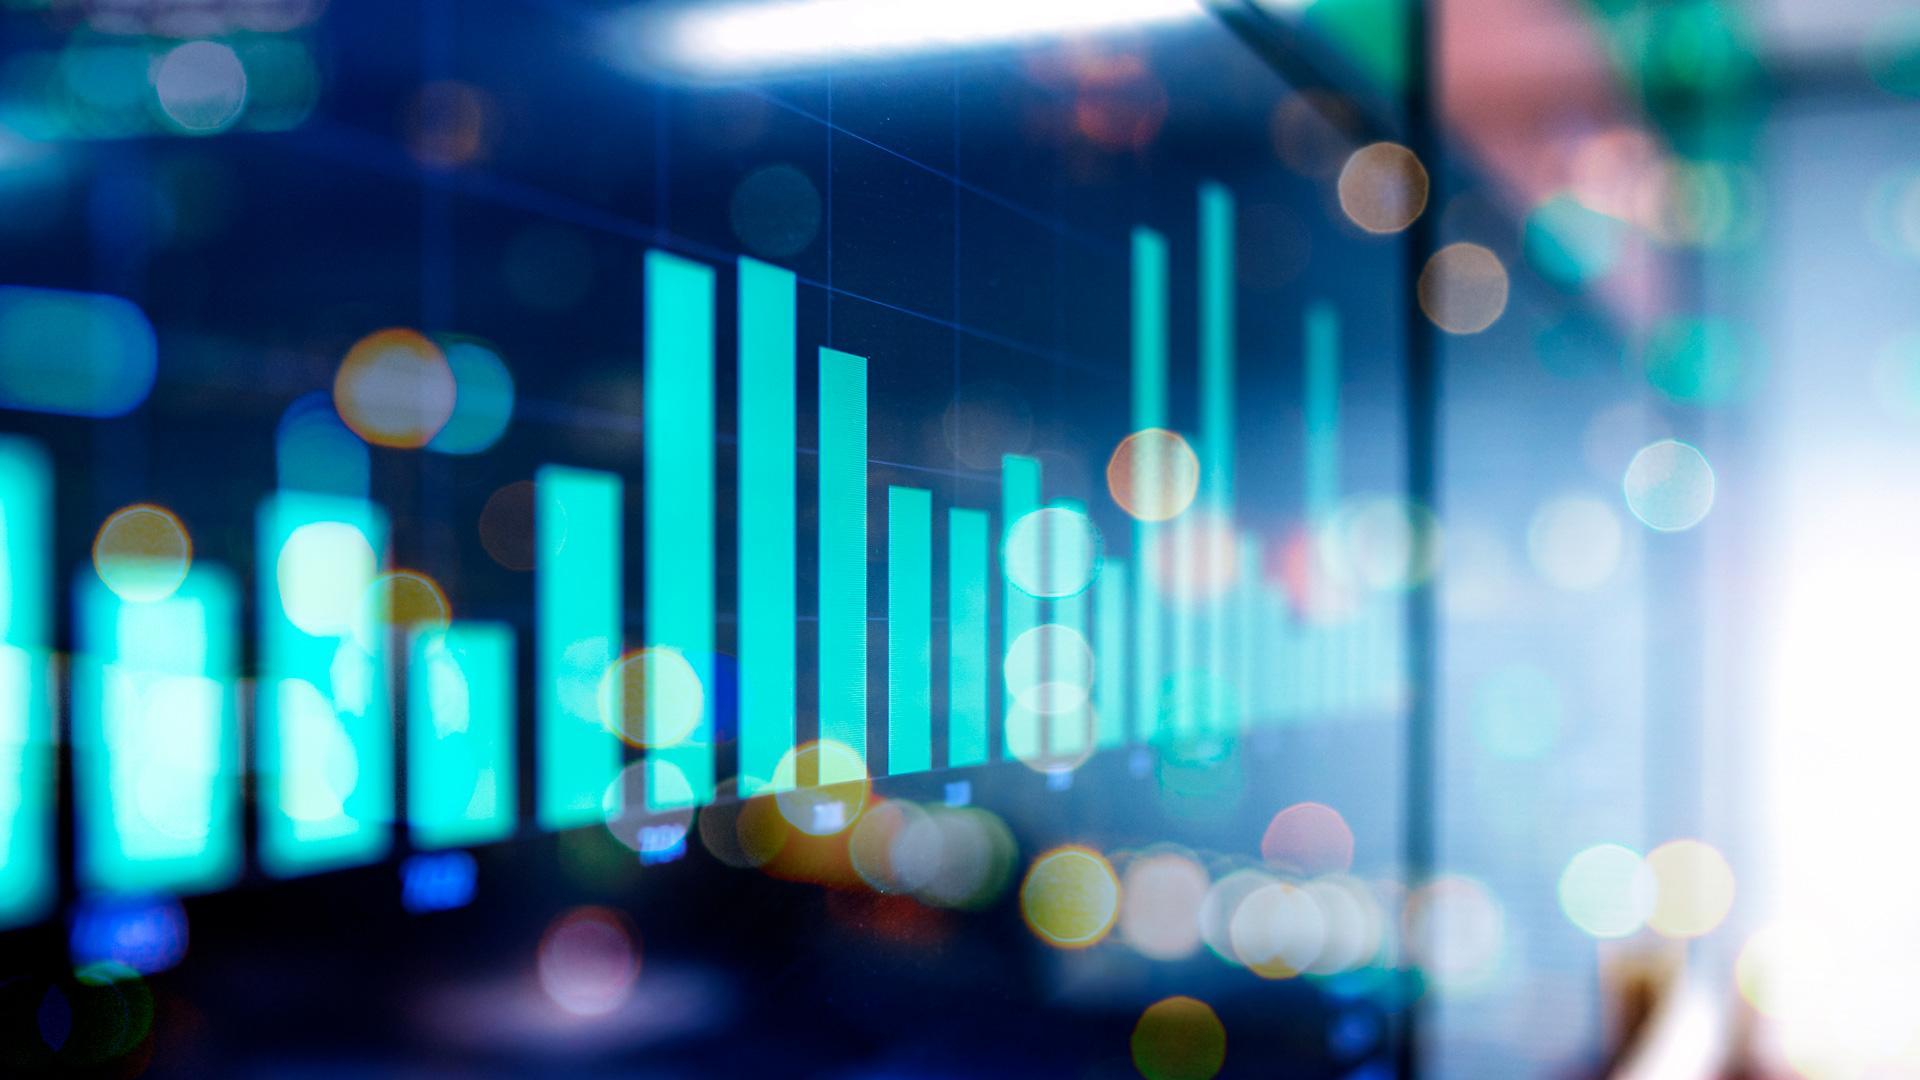 Our data | EUROCONTROL